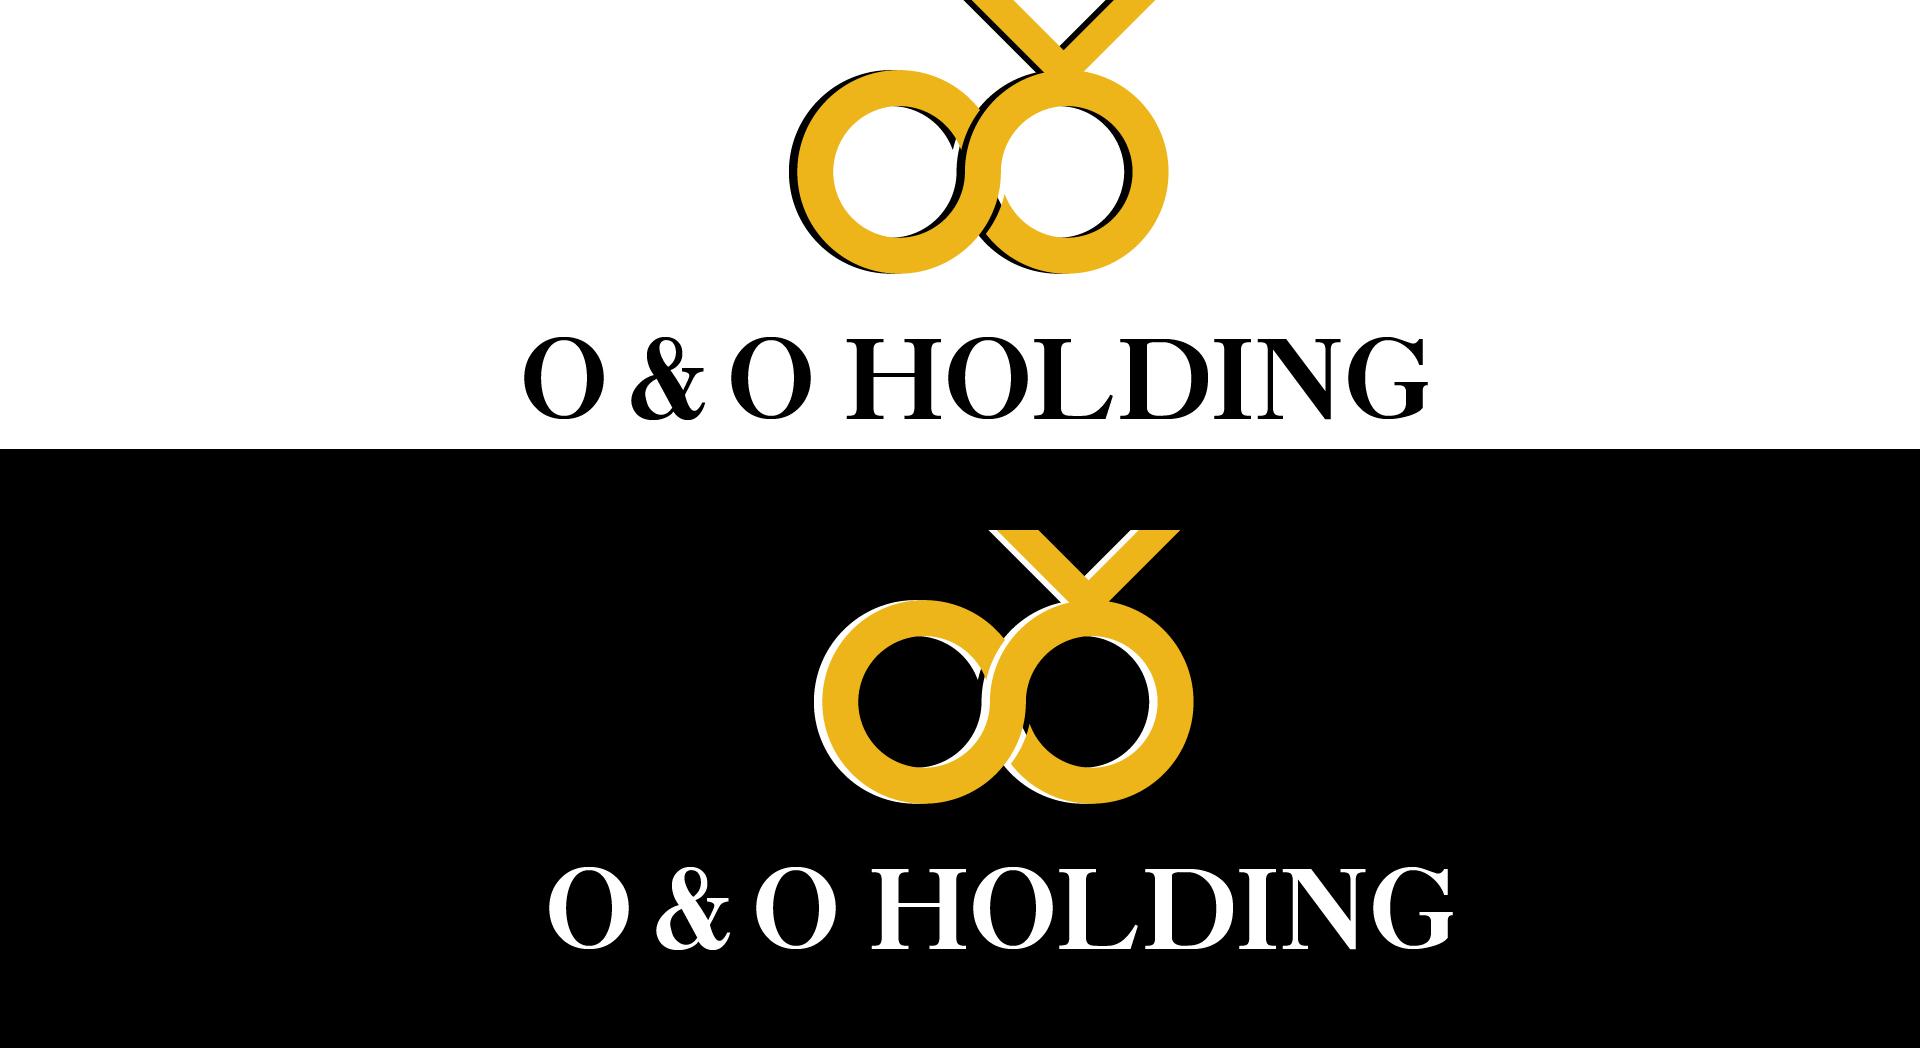 "Разработка Логотипа +  Фирменного знака для компании ""O & O HOLDING"" фото f_5225c7b8ac666947.jpg"